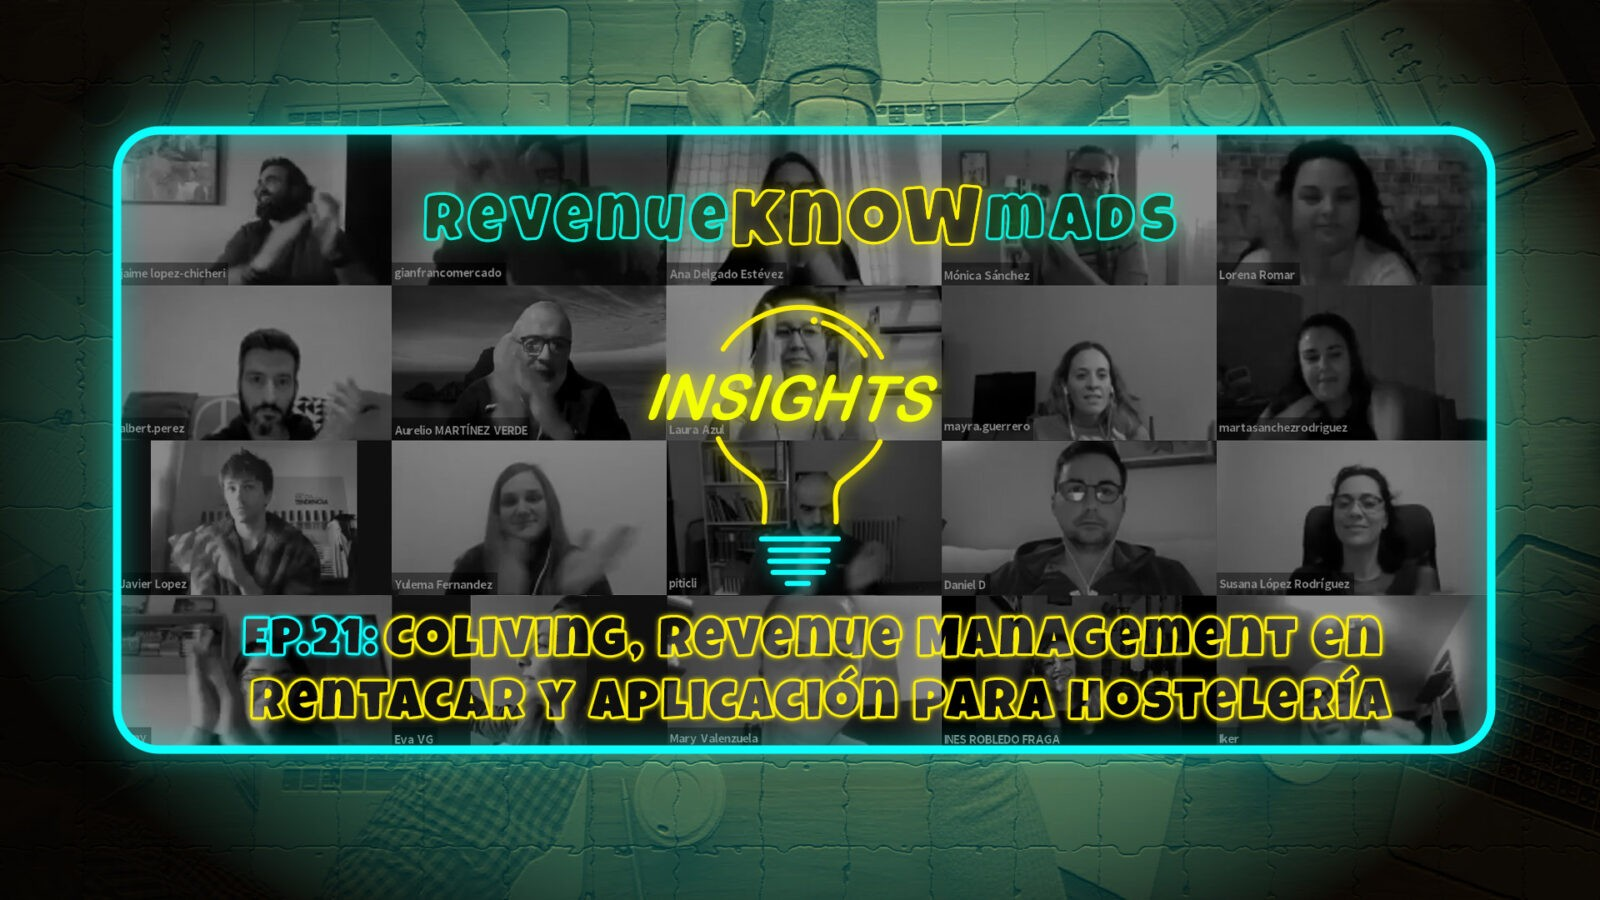 RevenueKnowmads Insights - Ep.21